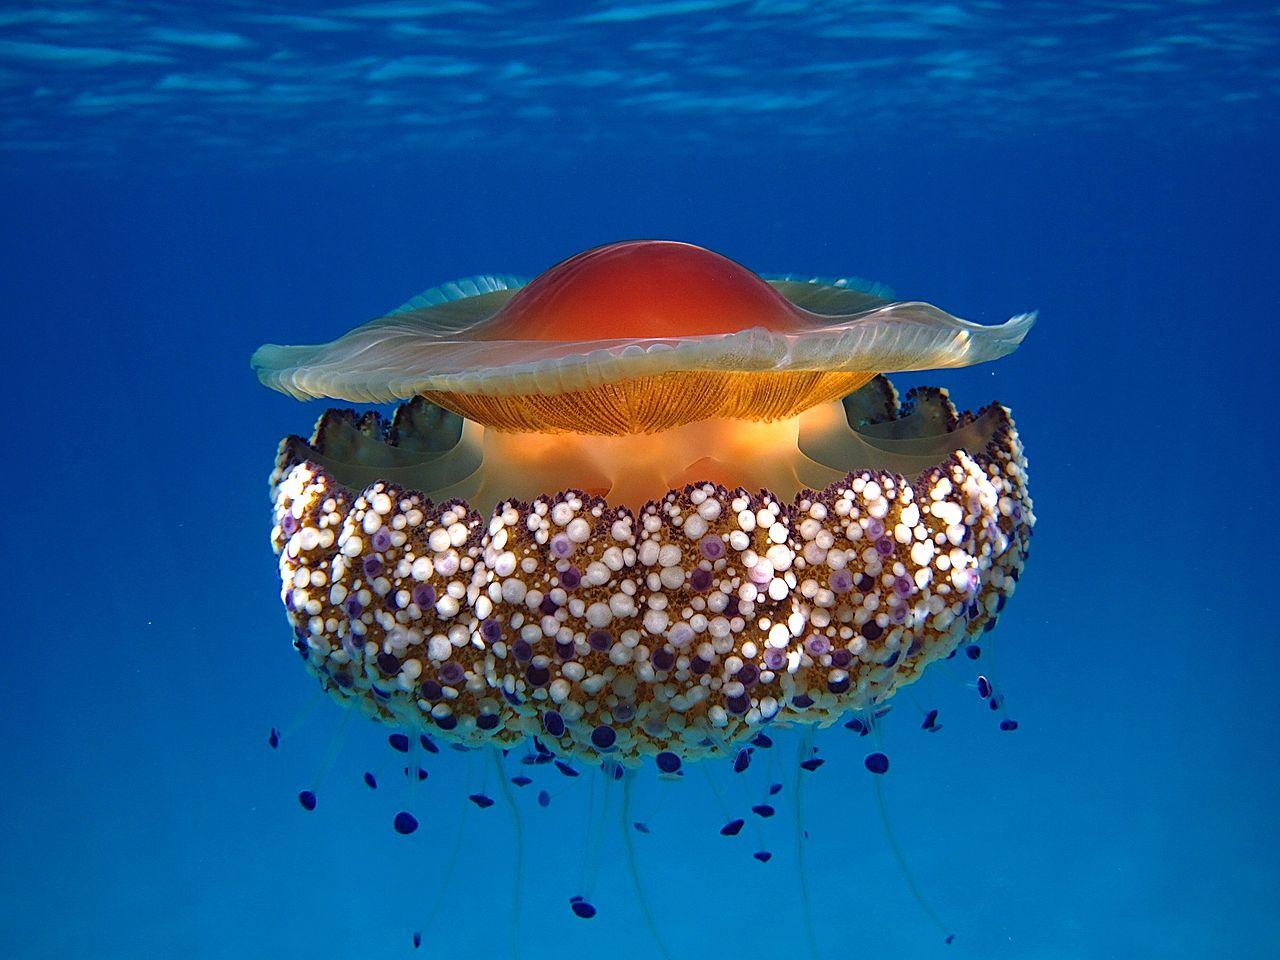 Fried-Egg Jellyfish